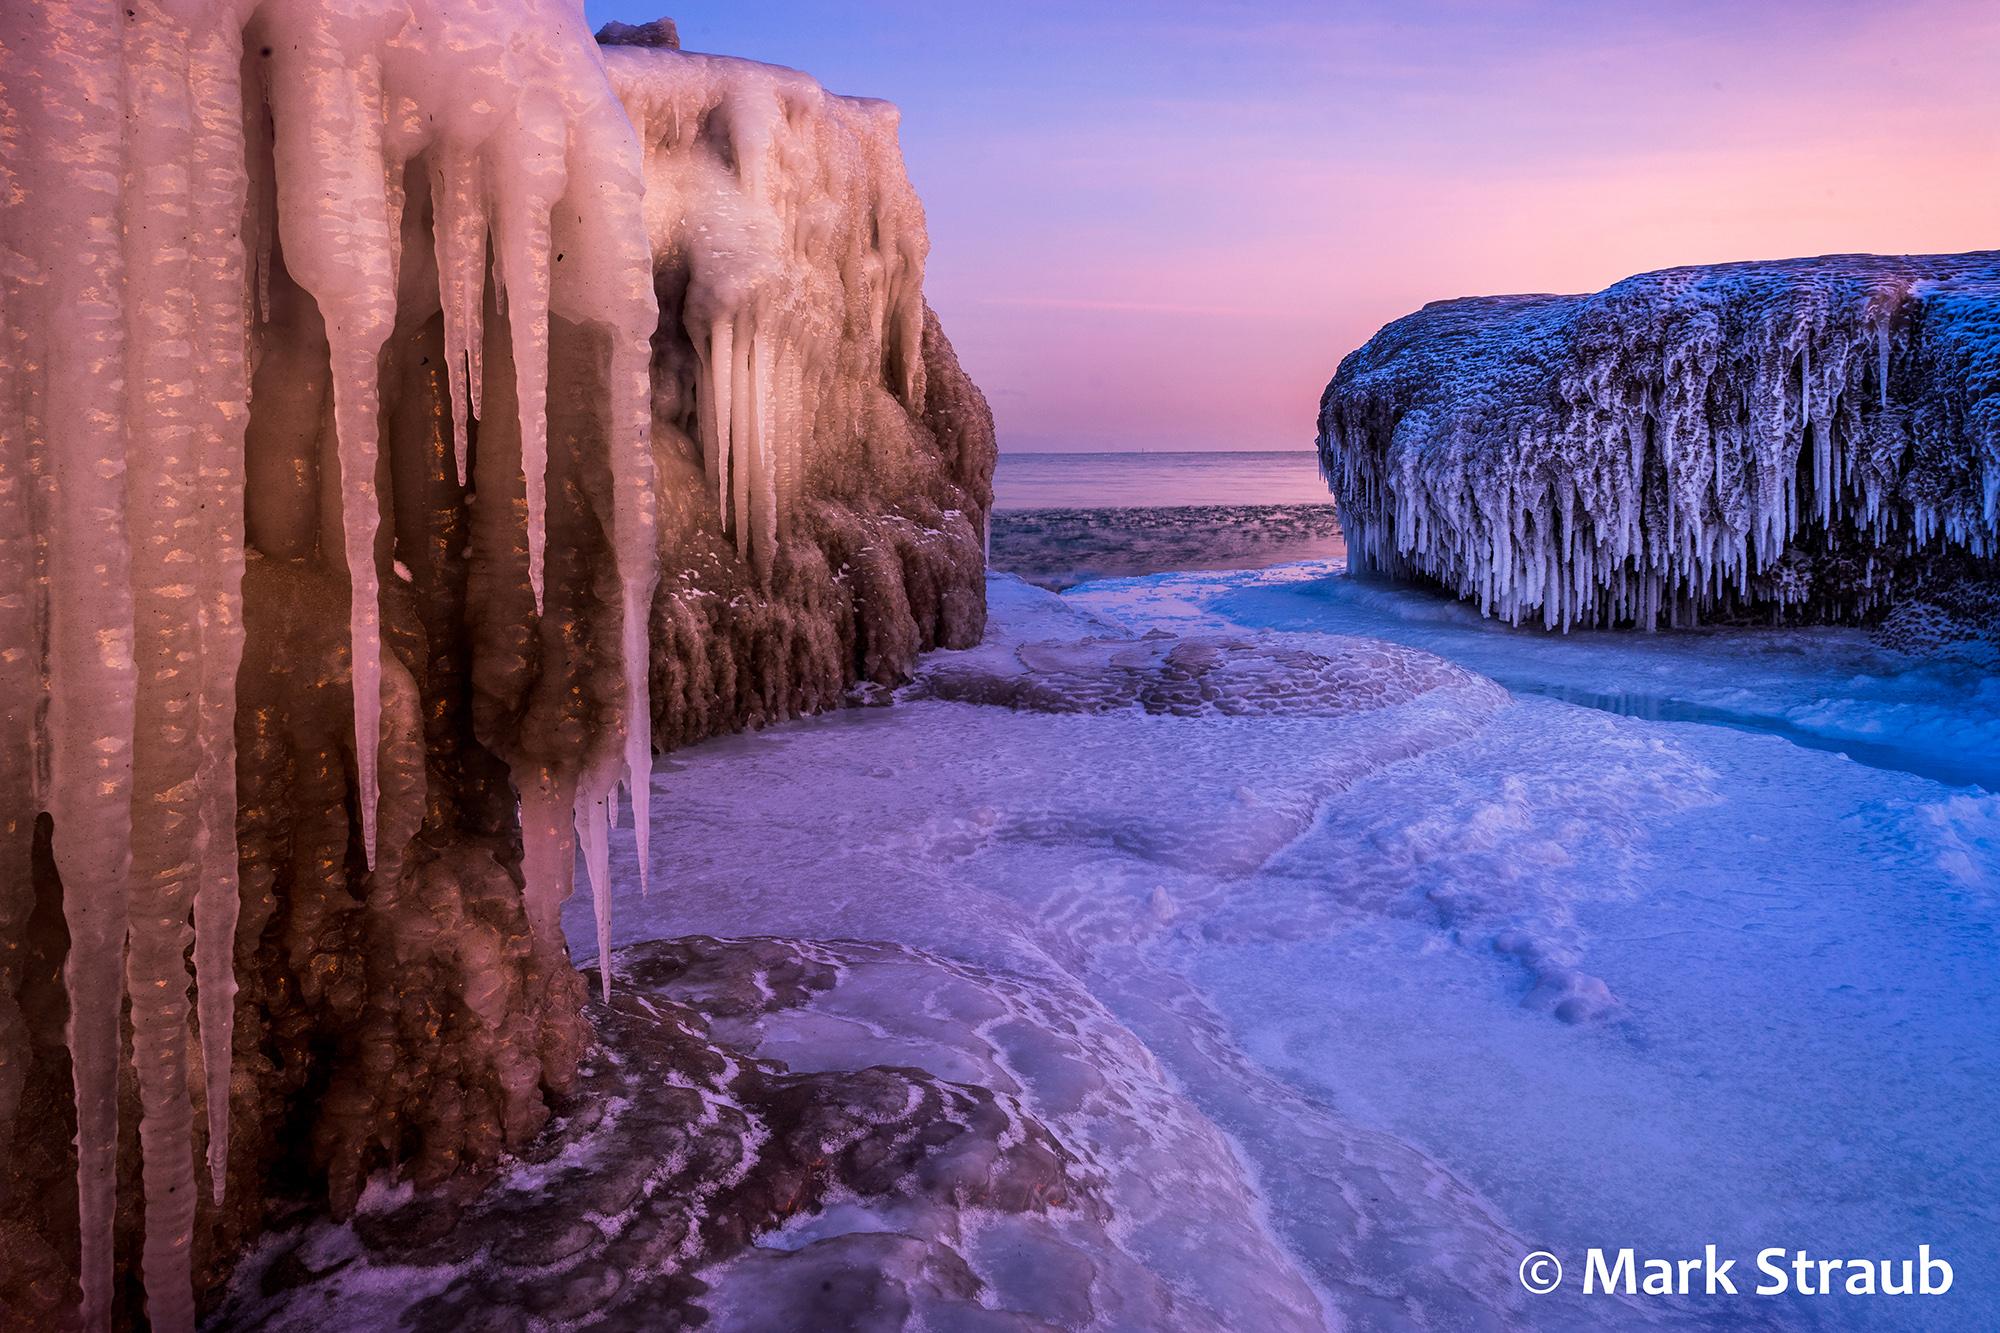 The frozen shore of Lake Michigan at sunrise